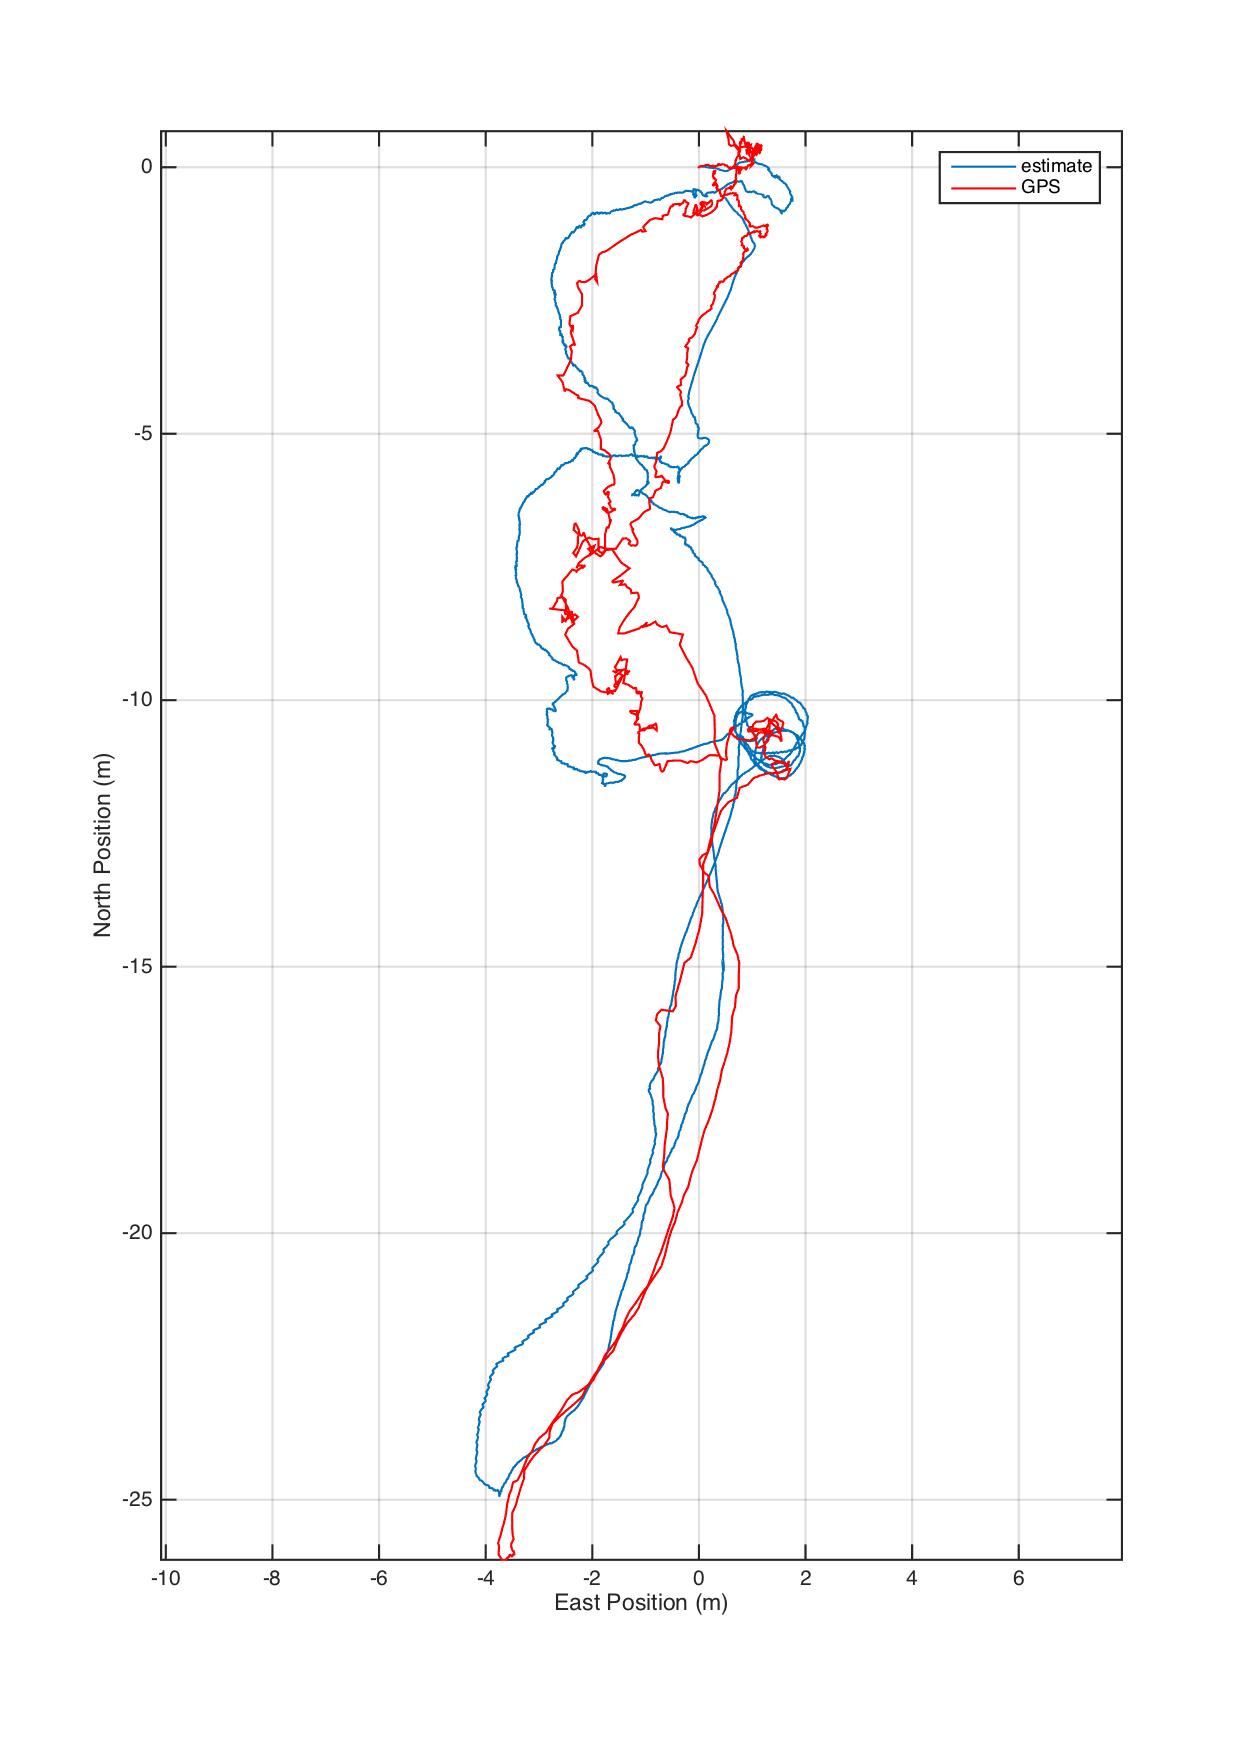 EKF2: GPS - vision fusion does not follow vision pose estimation